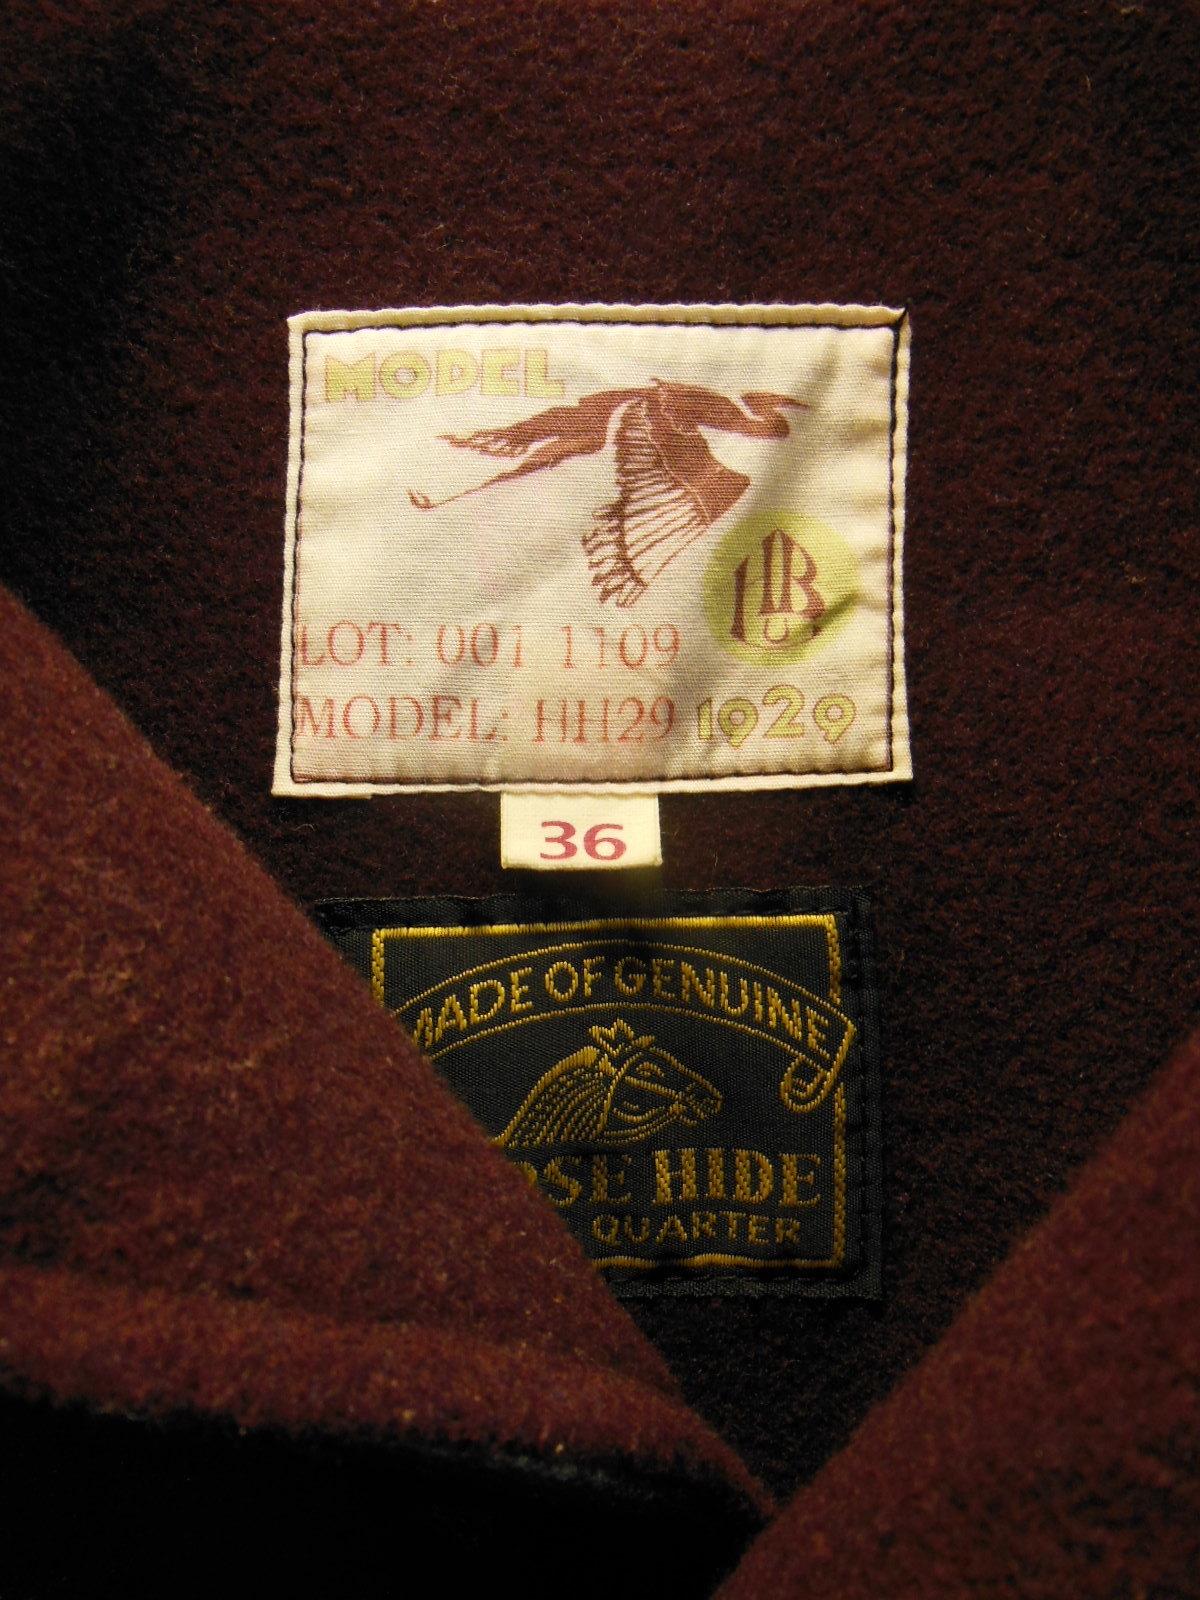 USED HIMEL BROTHERS LEATHER HERON 1929/新喜皮革製黒ホースハイド/SIZE-36/ボタンフロント A-1 ジャケット_c0187684_15024826.jpg